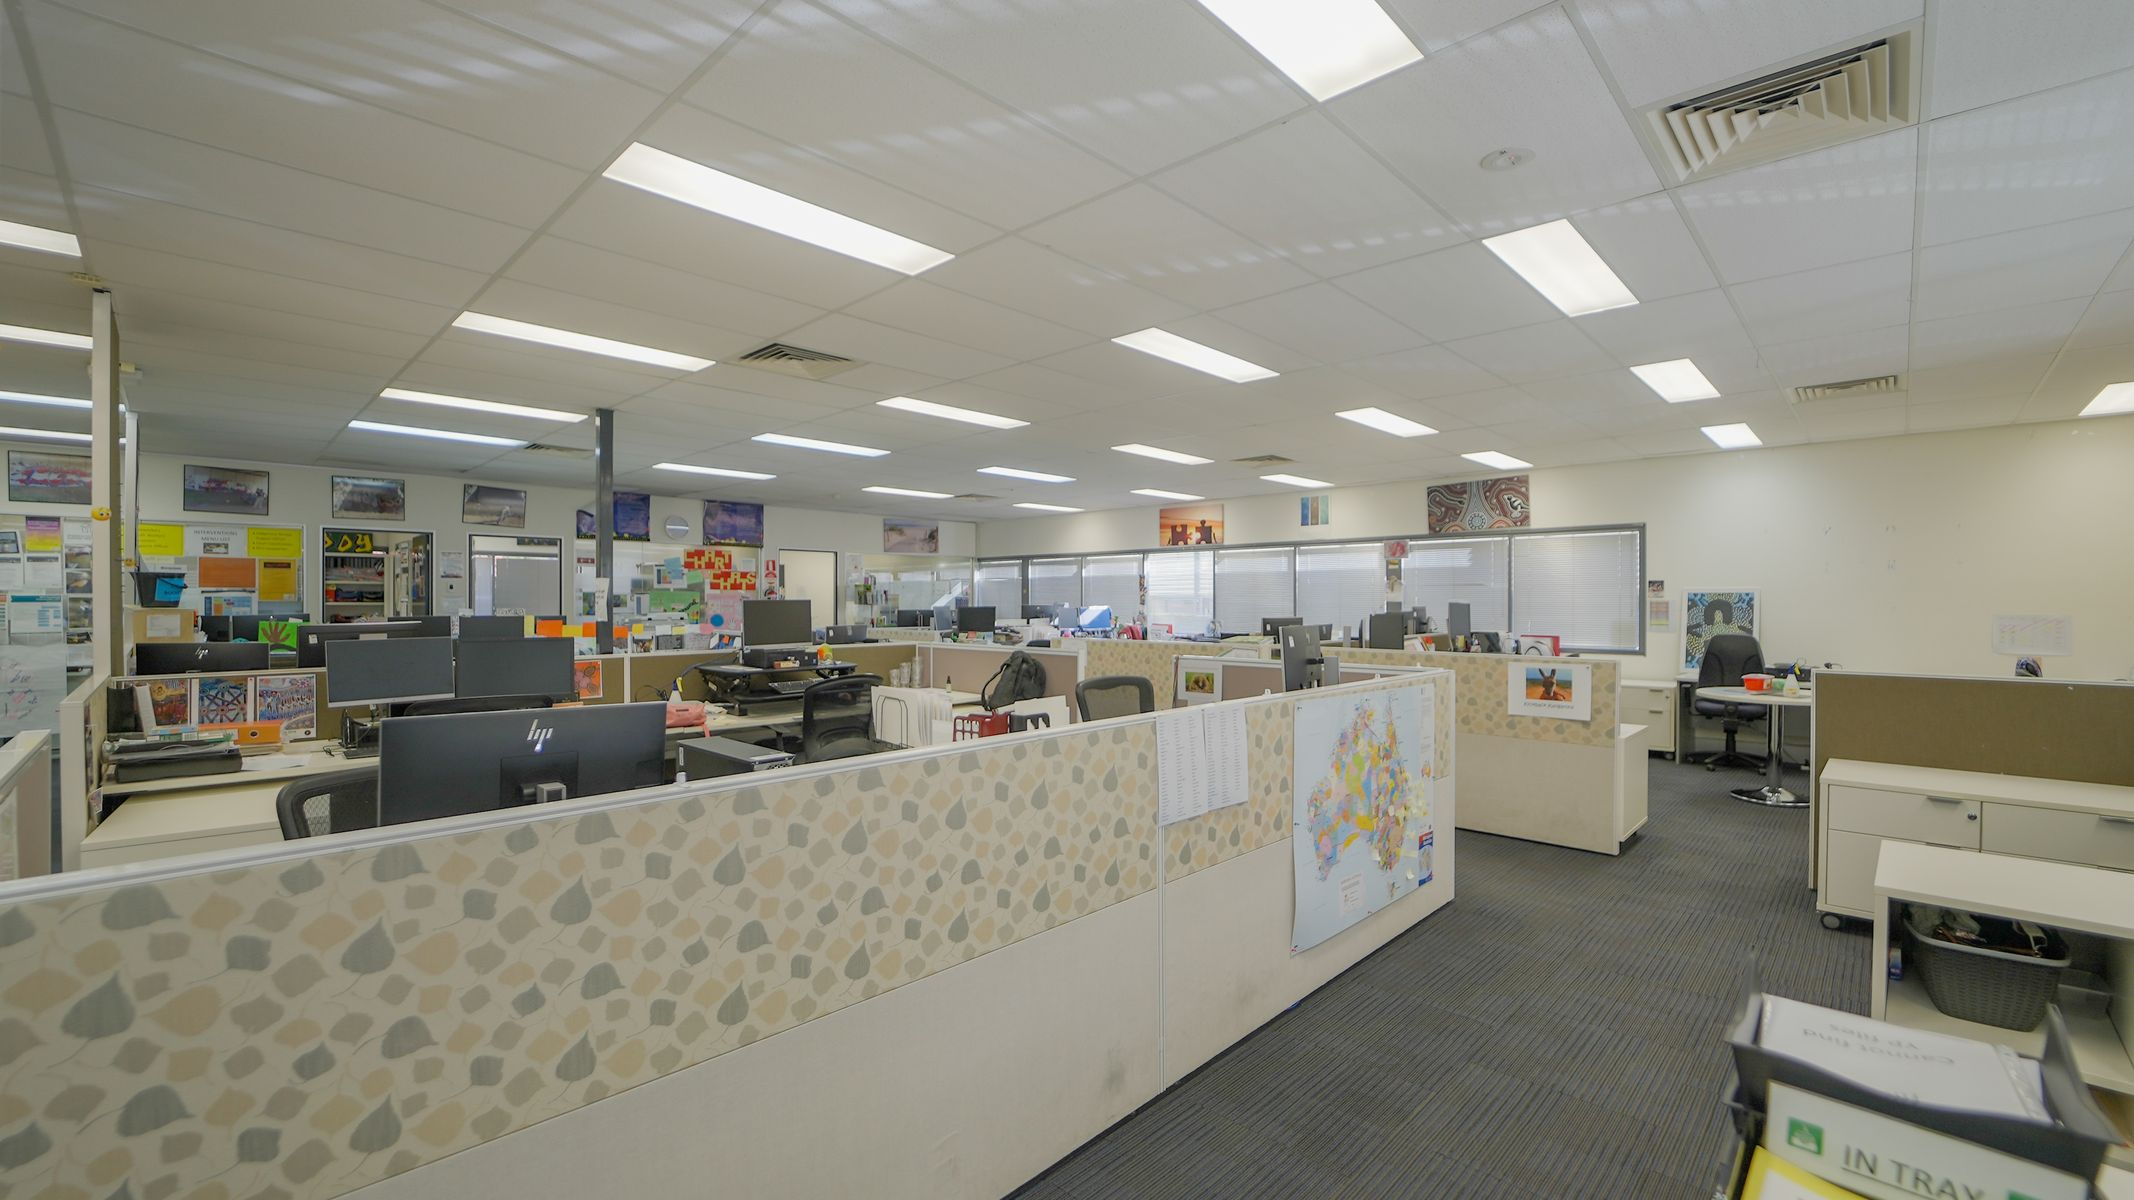 24-26 South Street, Ipswich, QLD 4305